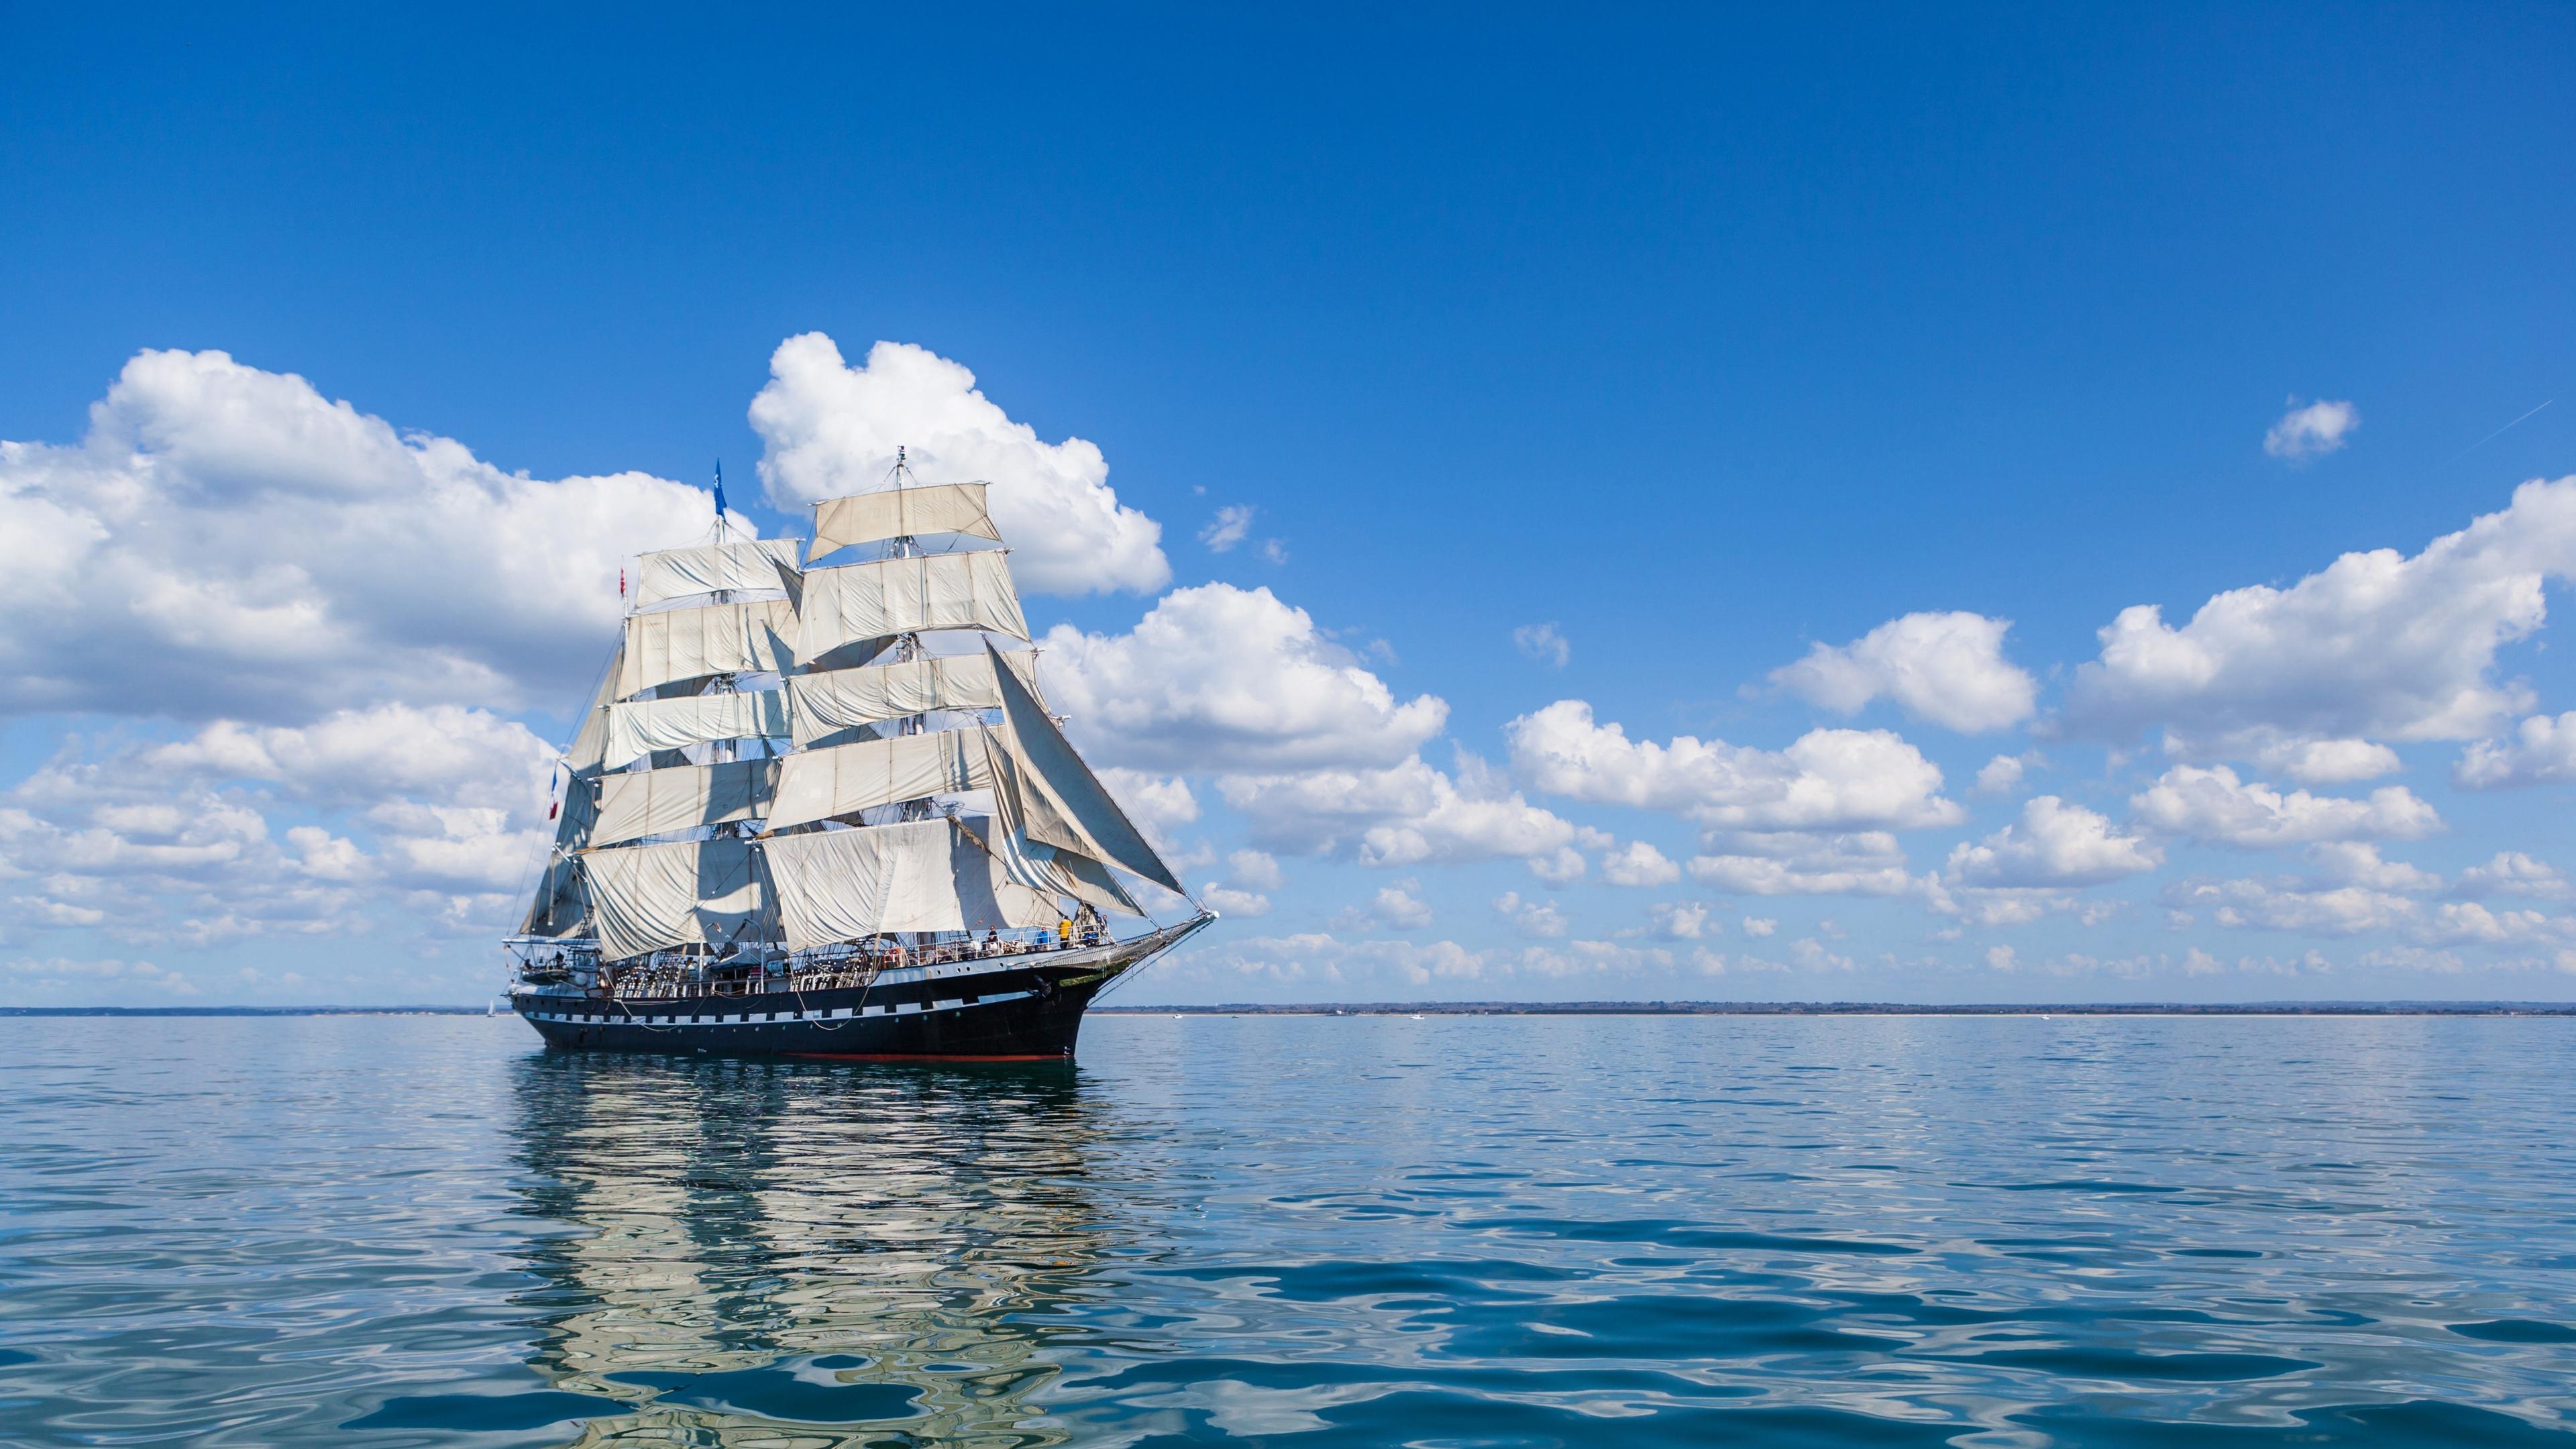 Wallpaper download mast - Ship 4k 1280x1024 Resolution